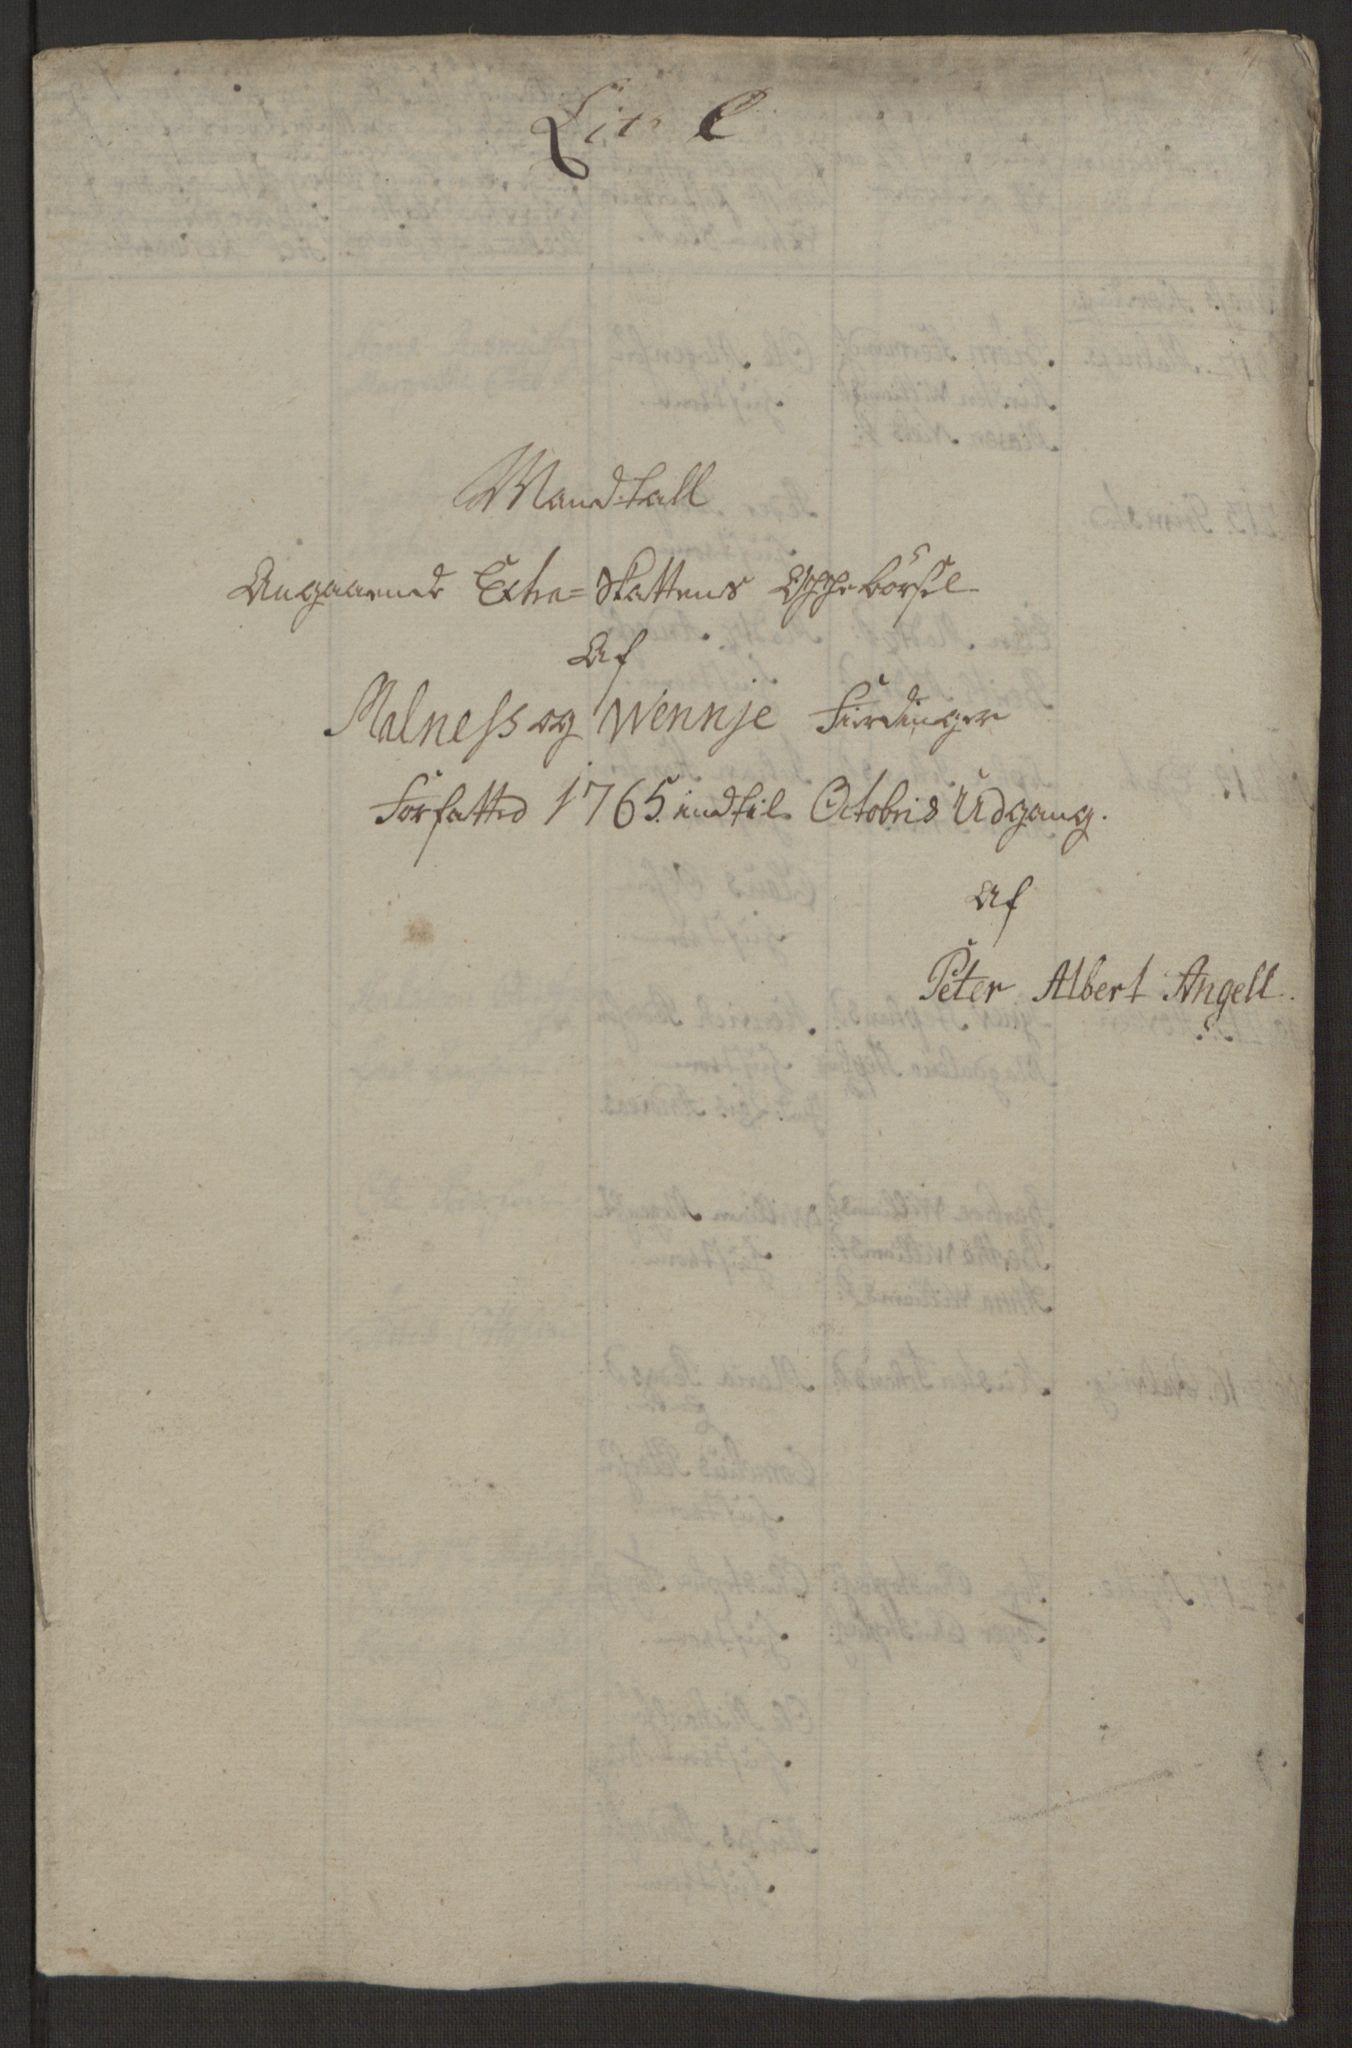 RA, Rentekammeret inntil 1814, Realistisk ordnet avdeling, Ol/L0022a: [Gg 10]: Ekstraskatten, 23.09.1762. Nordlands amt, 1763-1769, s. 112